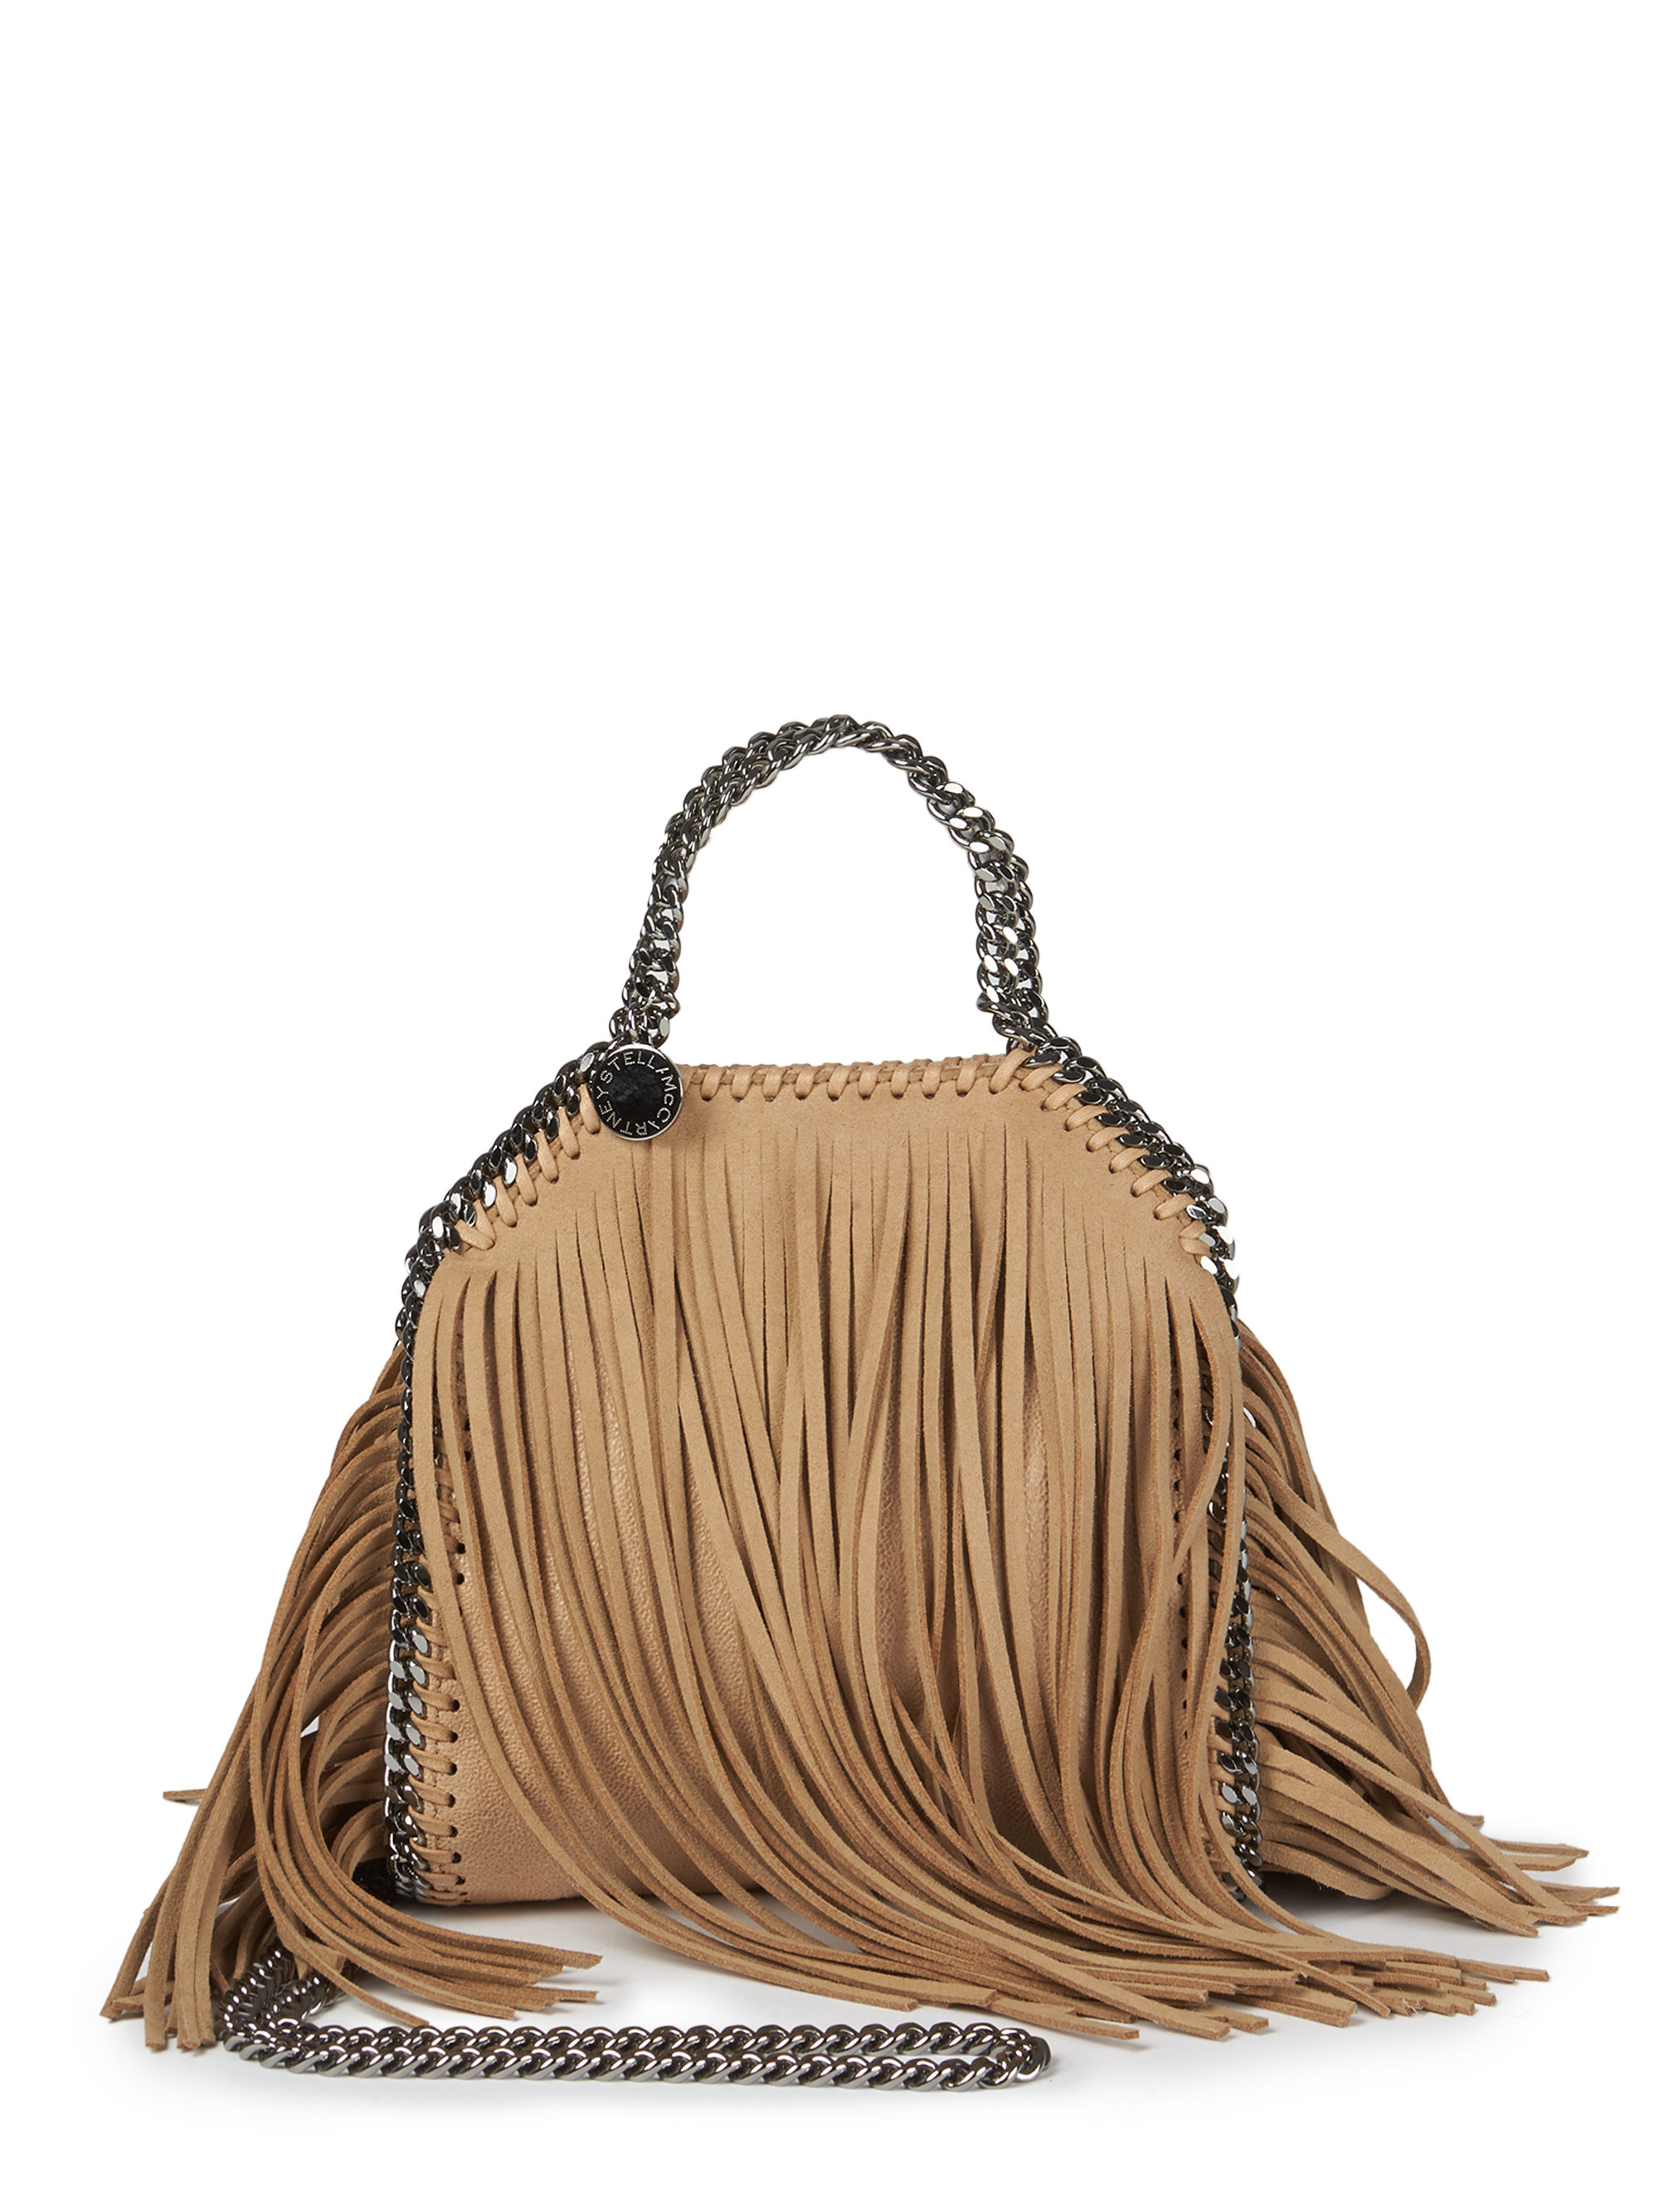 Lyst - Stella McCartney Tiny Bella Fringe Foldover Shoulder Bag in ... b169197b97693